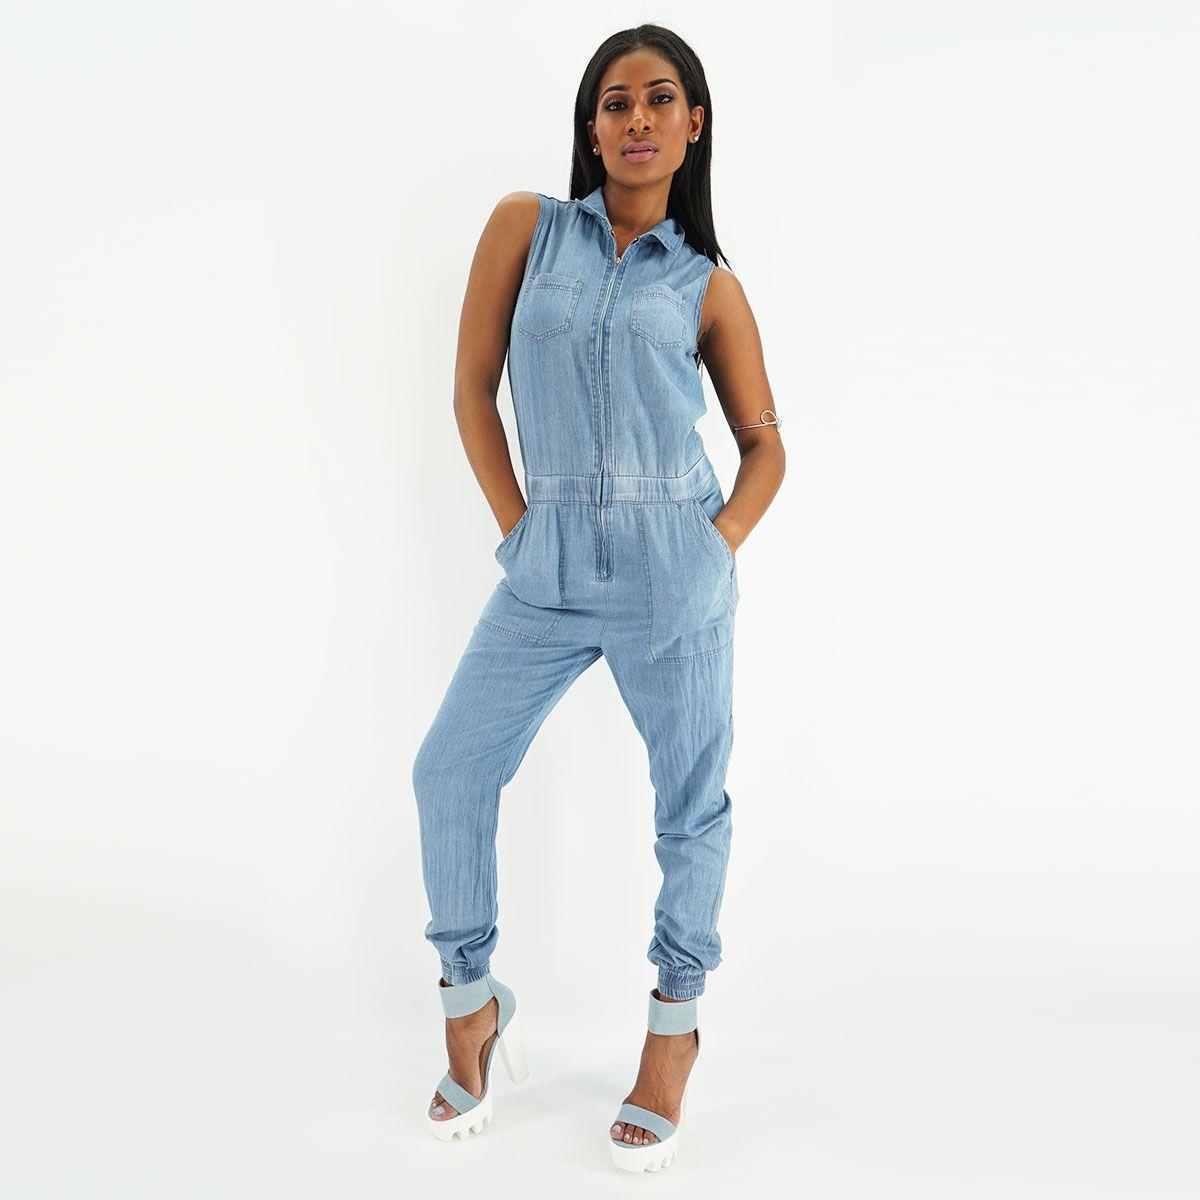 Denim Jumpsuit | Shop at YCMC.com #DenimOnDenim #Classic #Jumpsuit #Streetwear #MissYCMC #WomenTrend